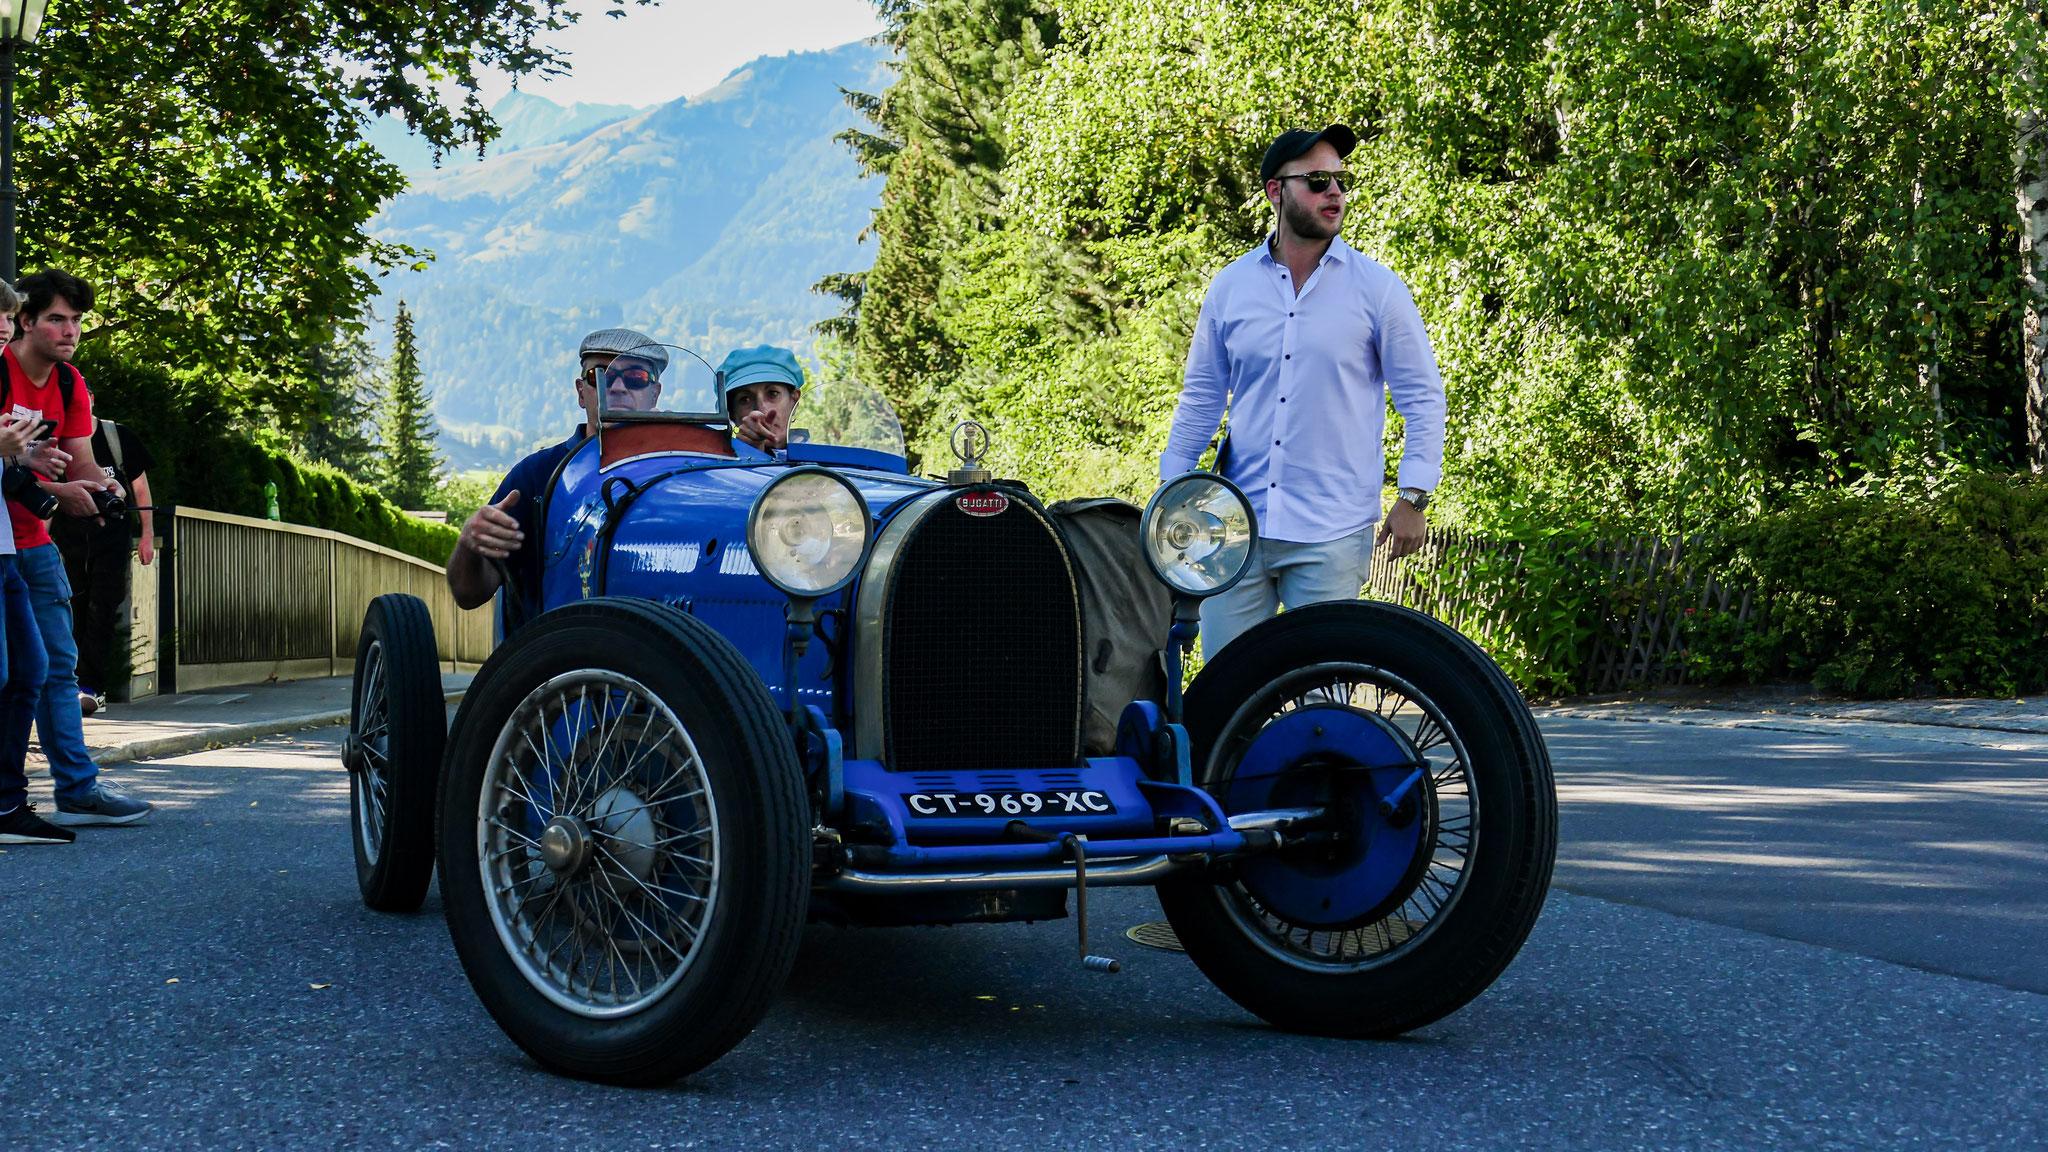 Bugatti Type 35 - CT-969-XC (ITA)